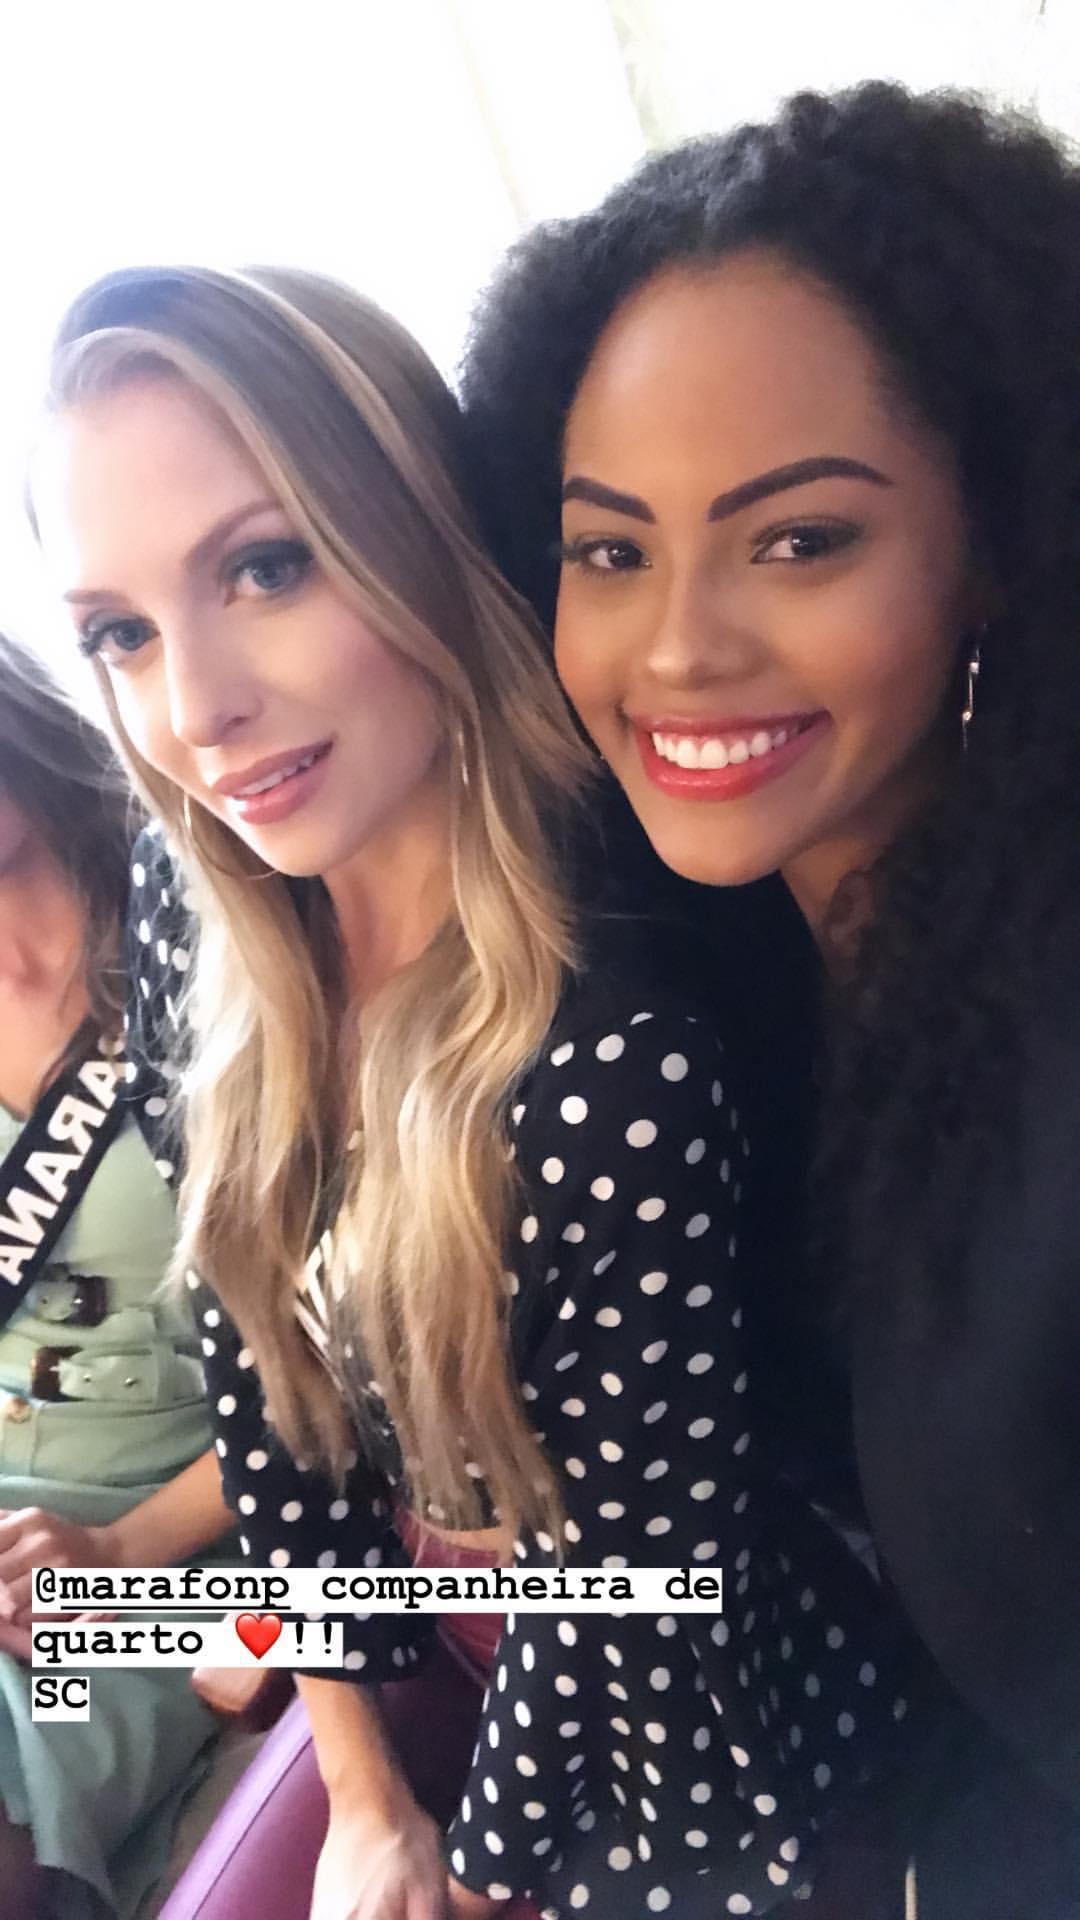 natali vitoria, top 15 de miss brasil universo 2019 /miss brasil teen universe 2017. primeira miss negra a vencer o miss roraima. - Página 9 51736011